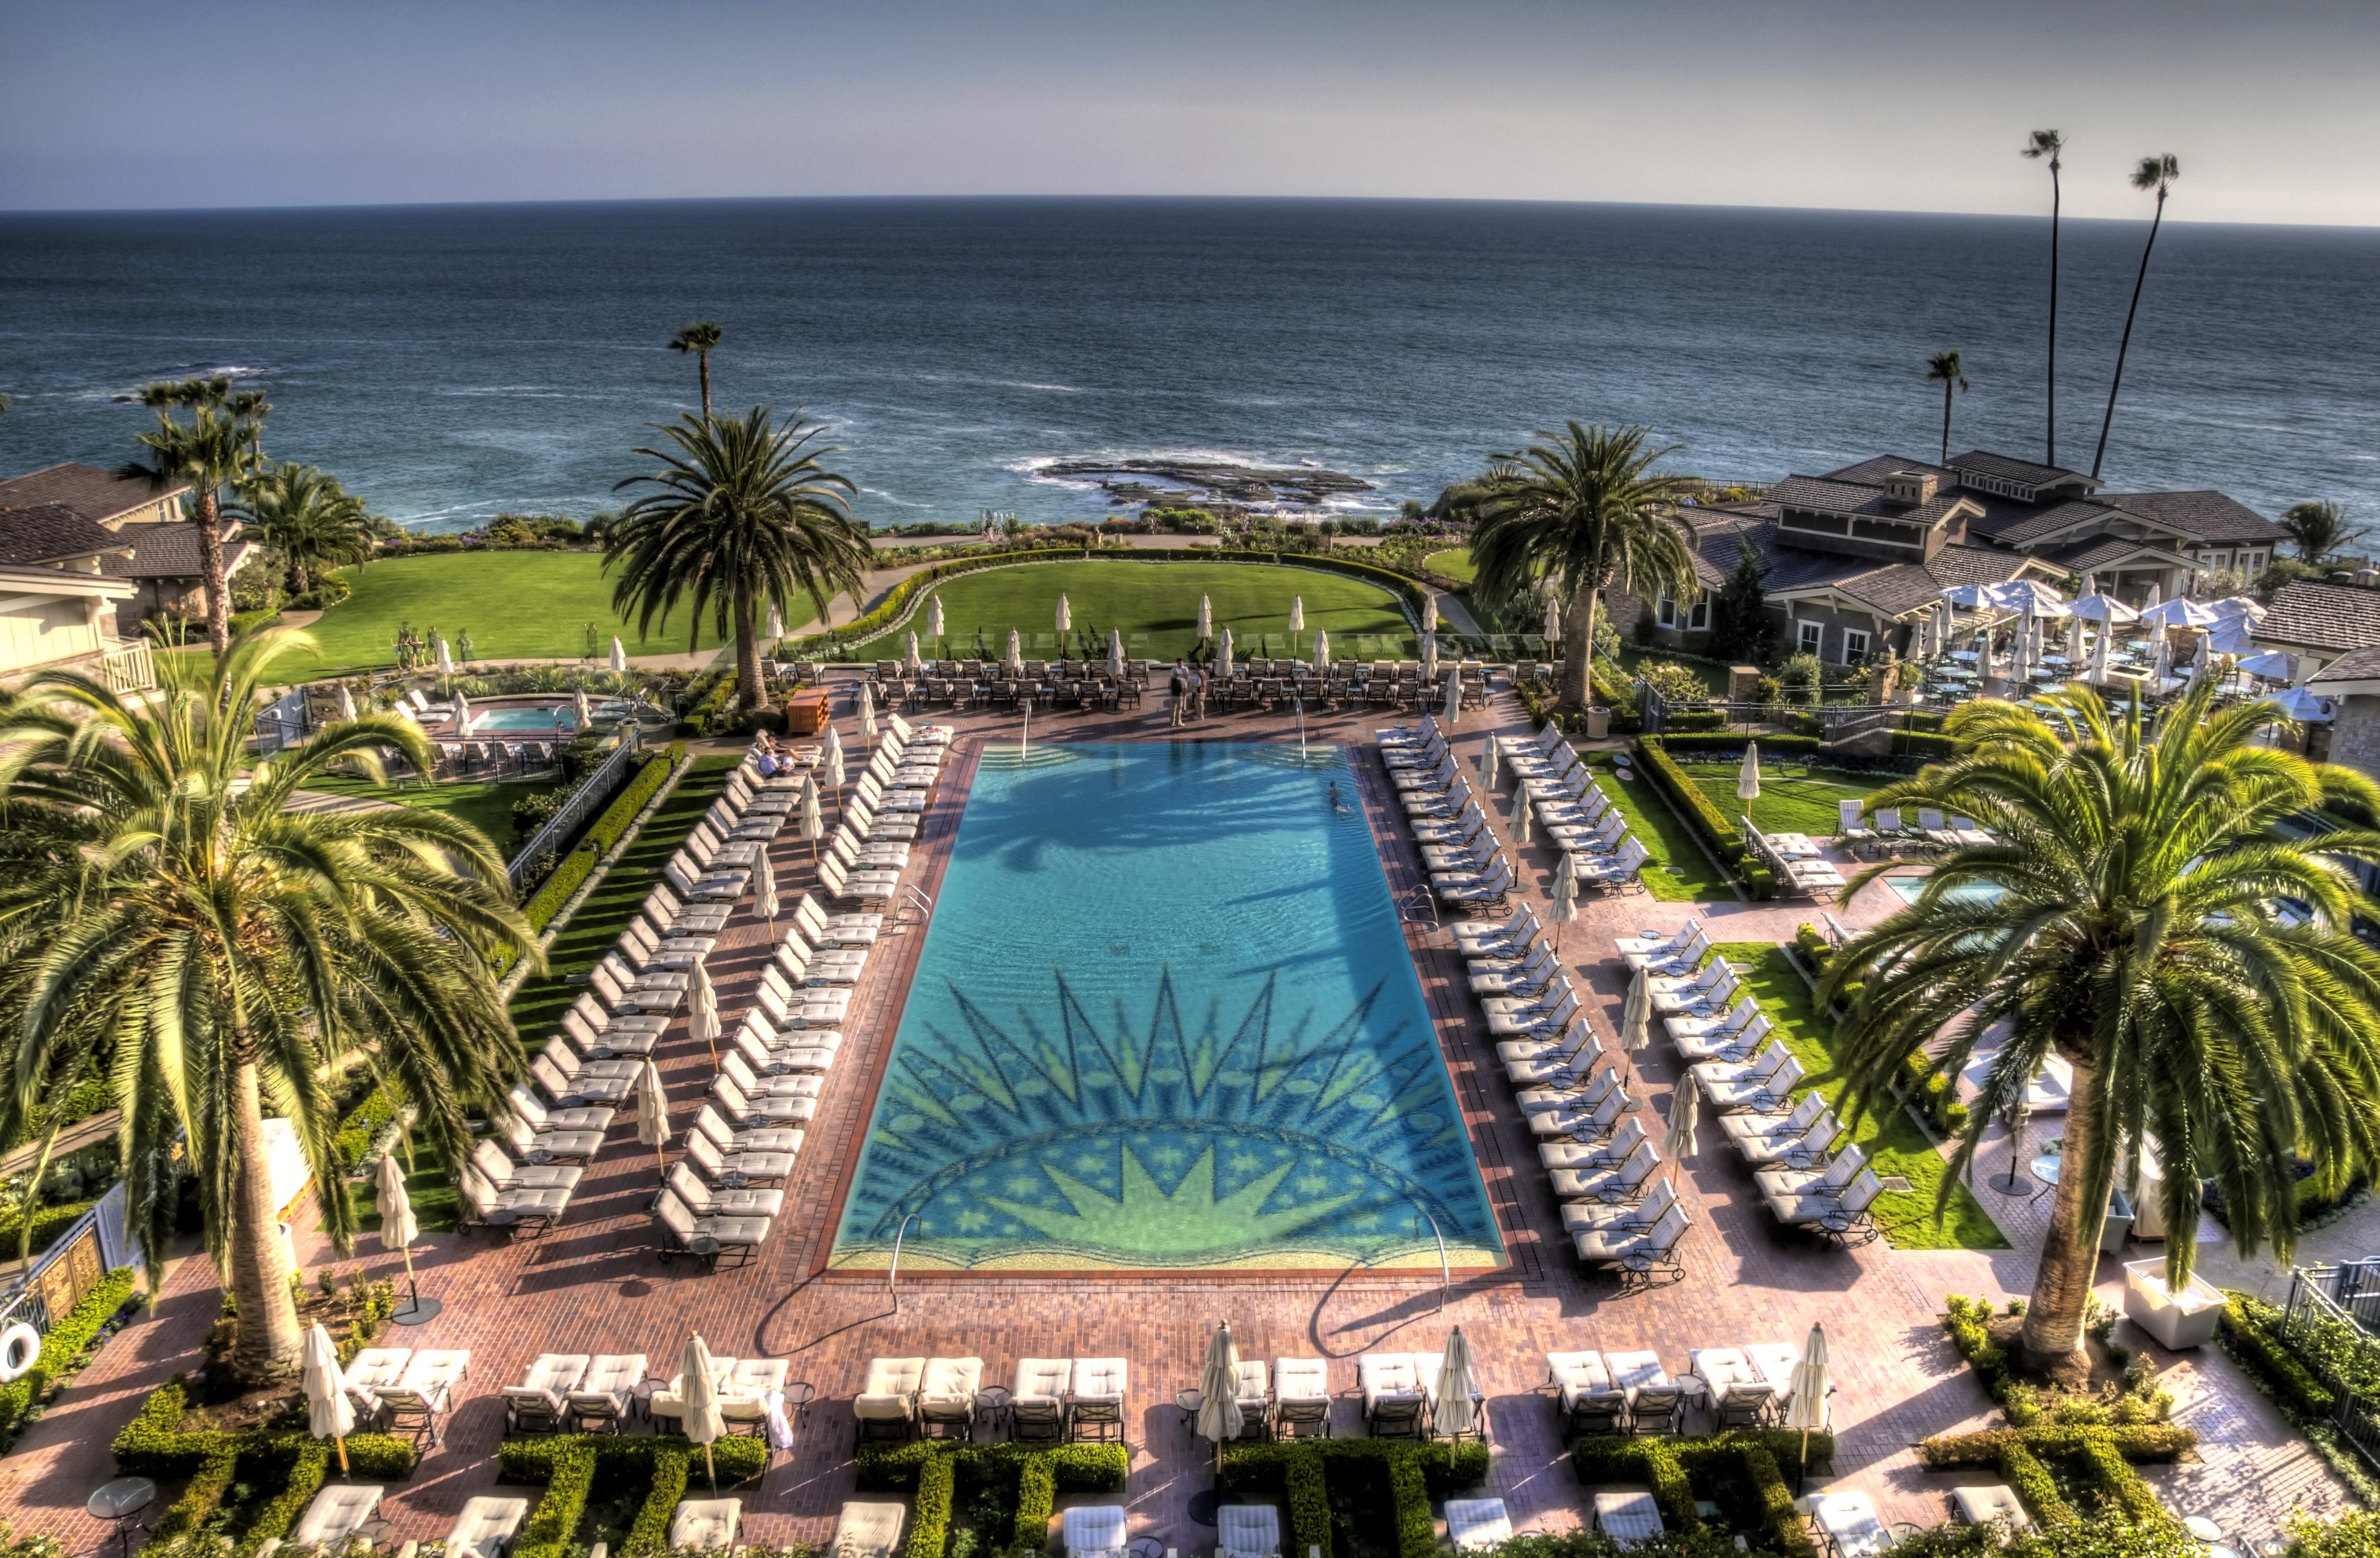 Hotels On Pch Newport Beach Ca